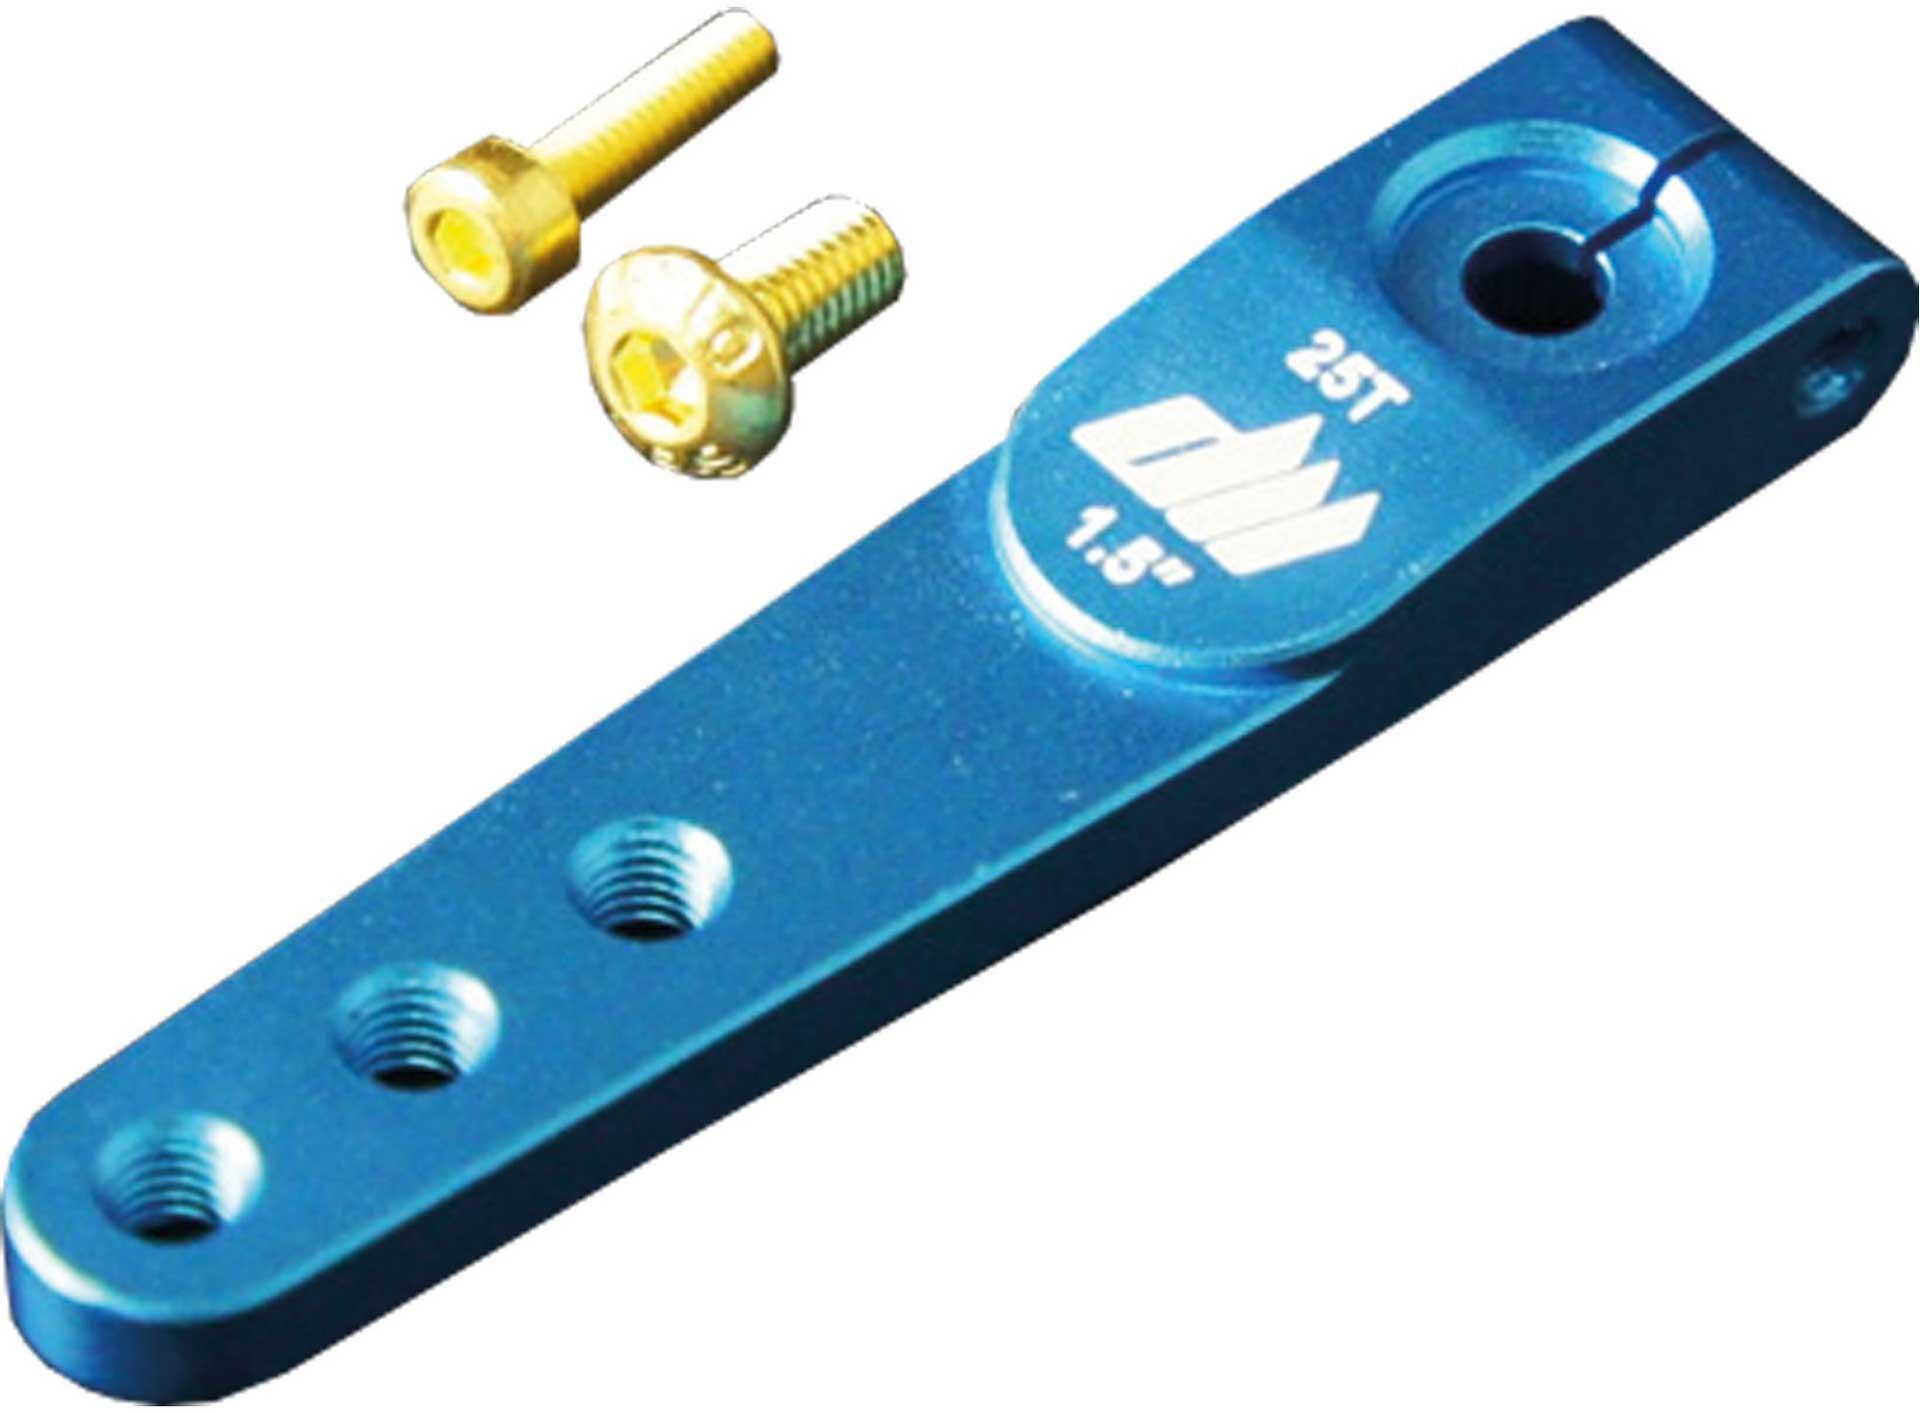 DUALSKY SERVO LEVER ALUMINIUM 25T 1-ARM 25/19MM M2,5 BLUE